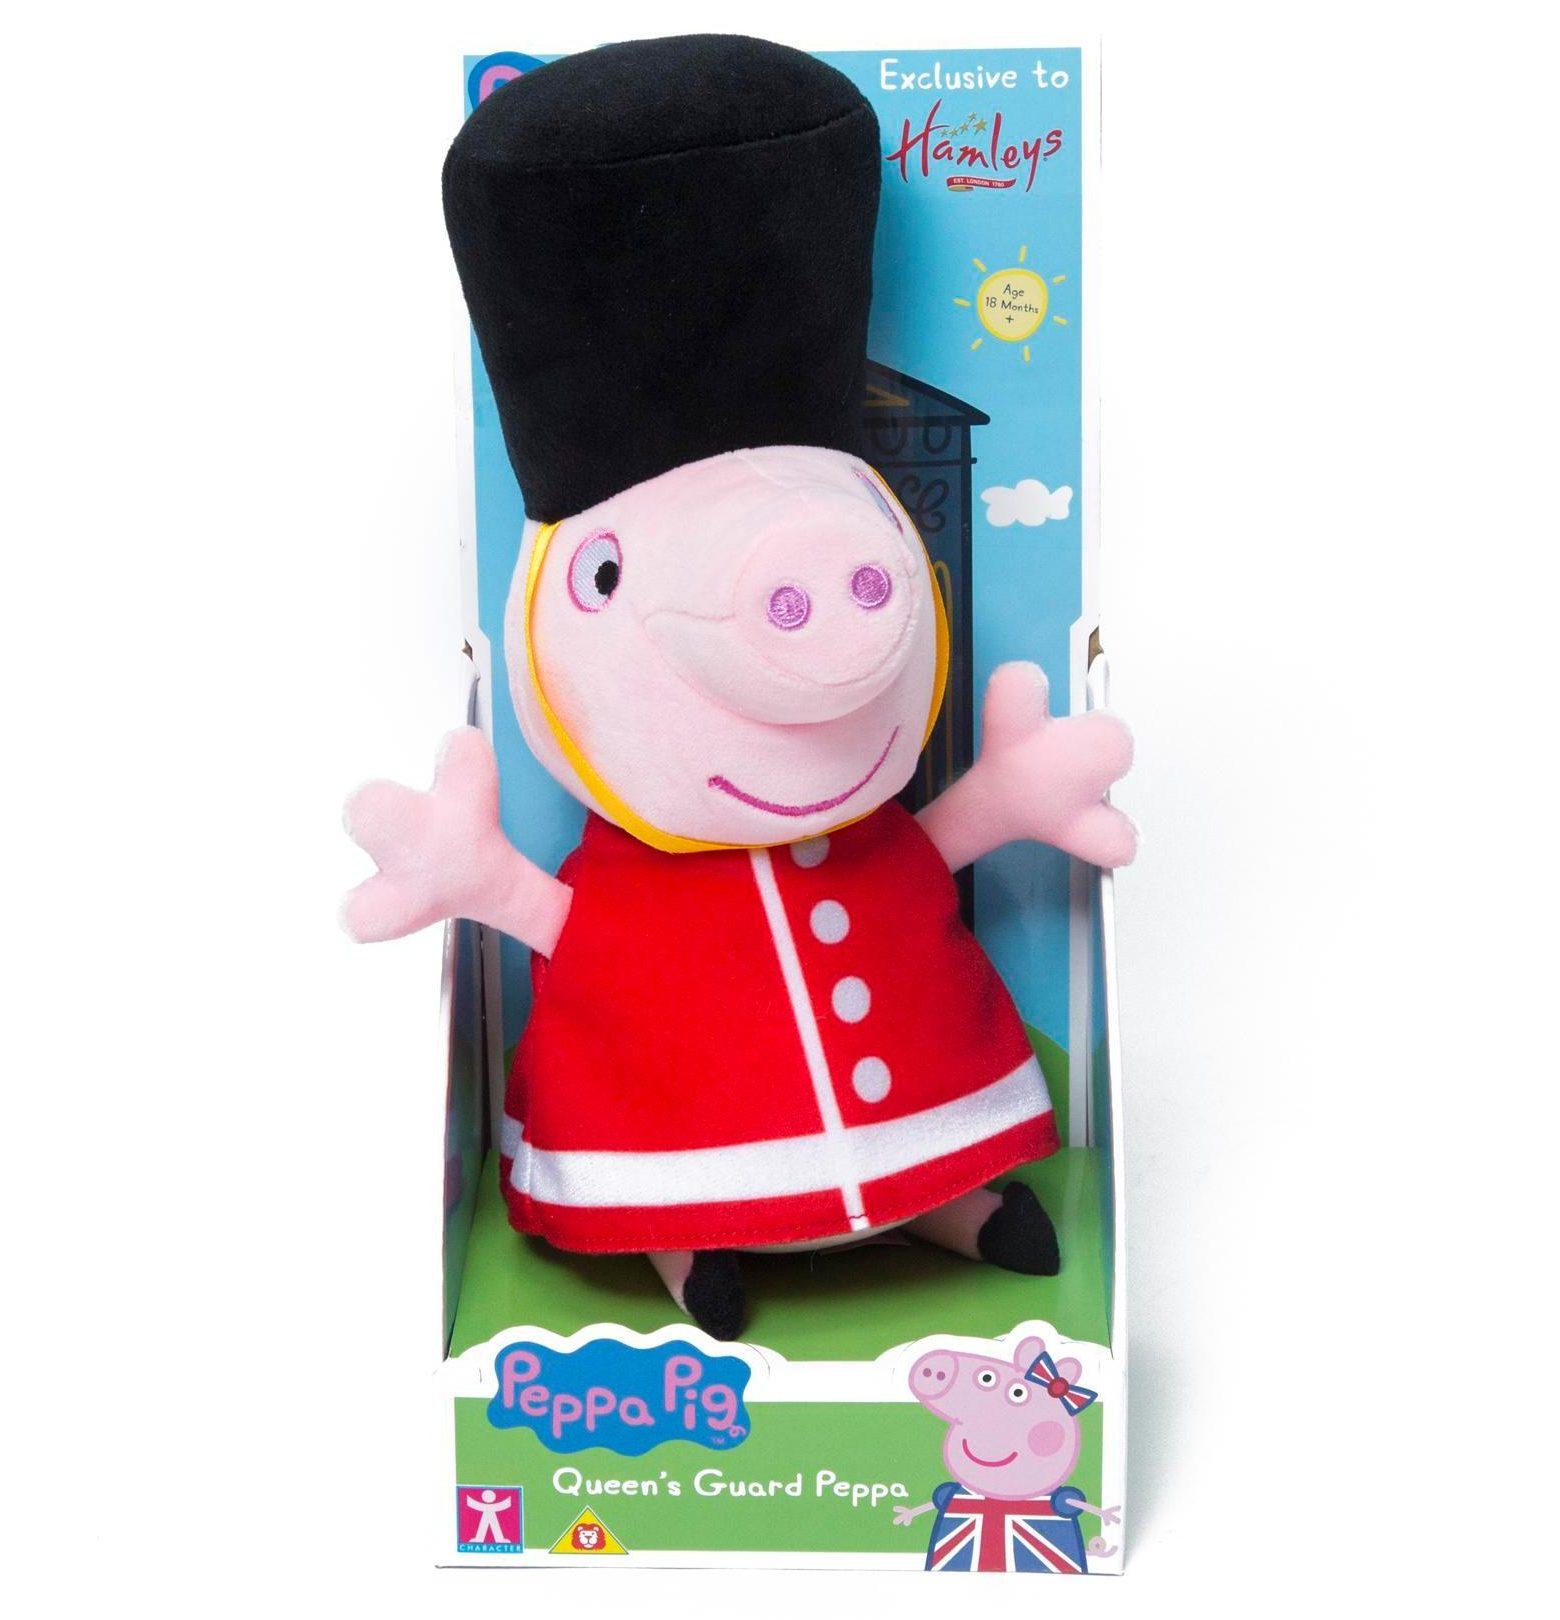 Hamleys Reveals Top 12 Toys For Christmas 2018 Including